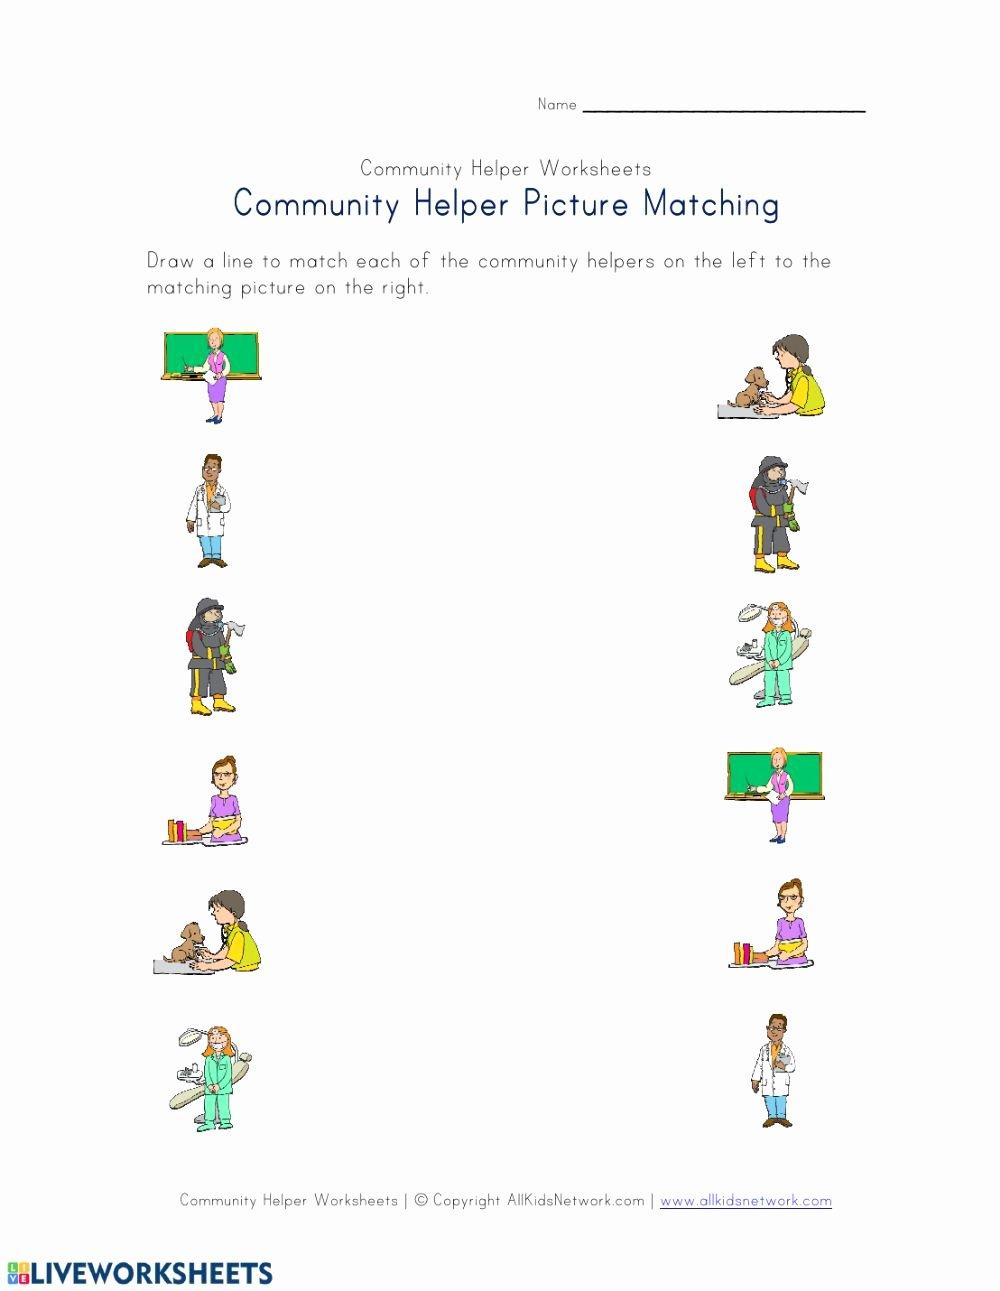 Community Helpers Worksheets for Preschoolers Unique Munity Helpers Interactive Worksheet